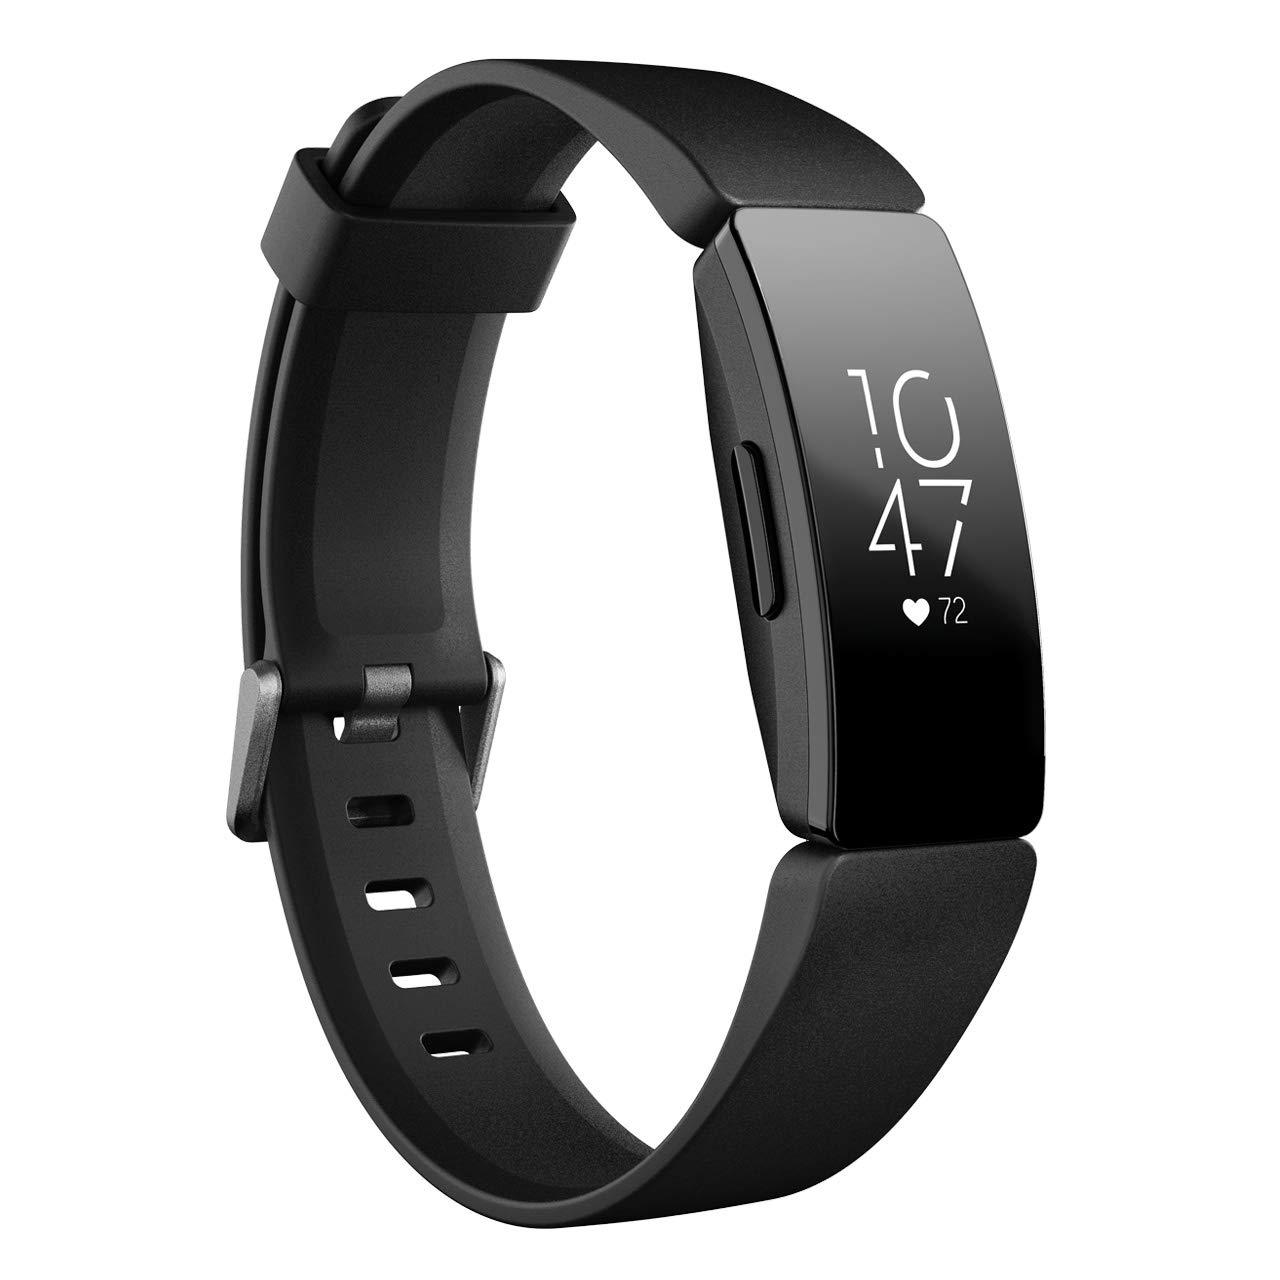 Fitbit InspireHR フィットネストラッカー Black L/Sサイズ  [日本正規品] FB413BKBK-FRCJK L/S Size Black B07P2Y68V7